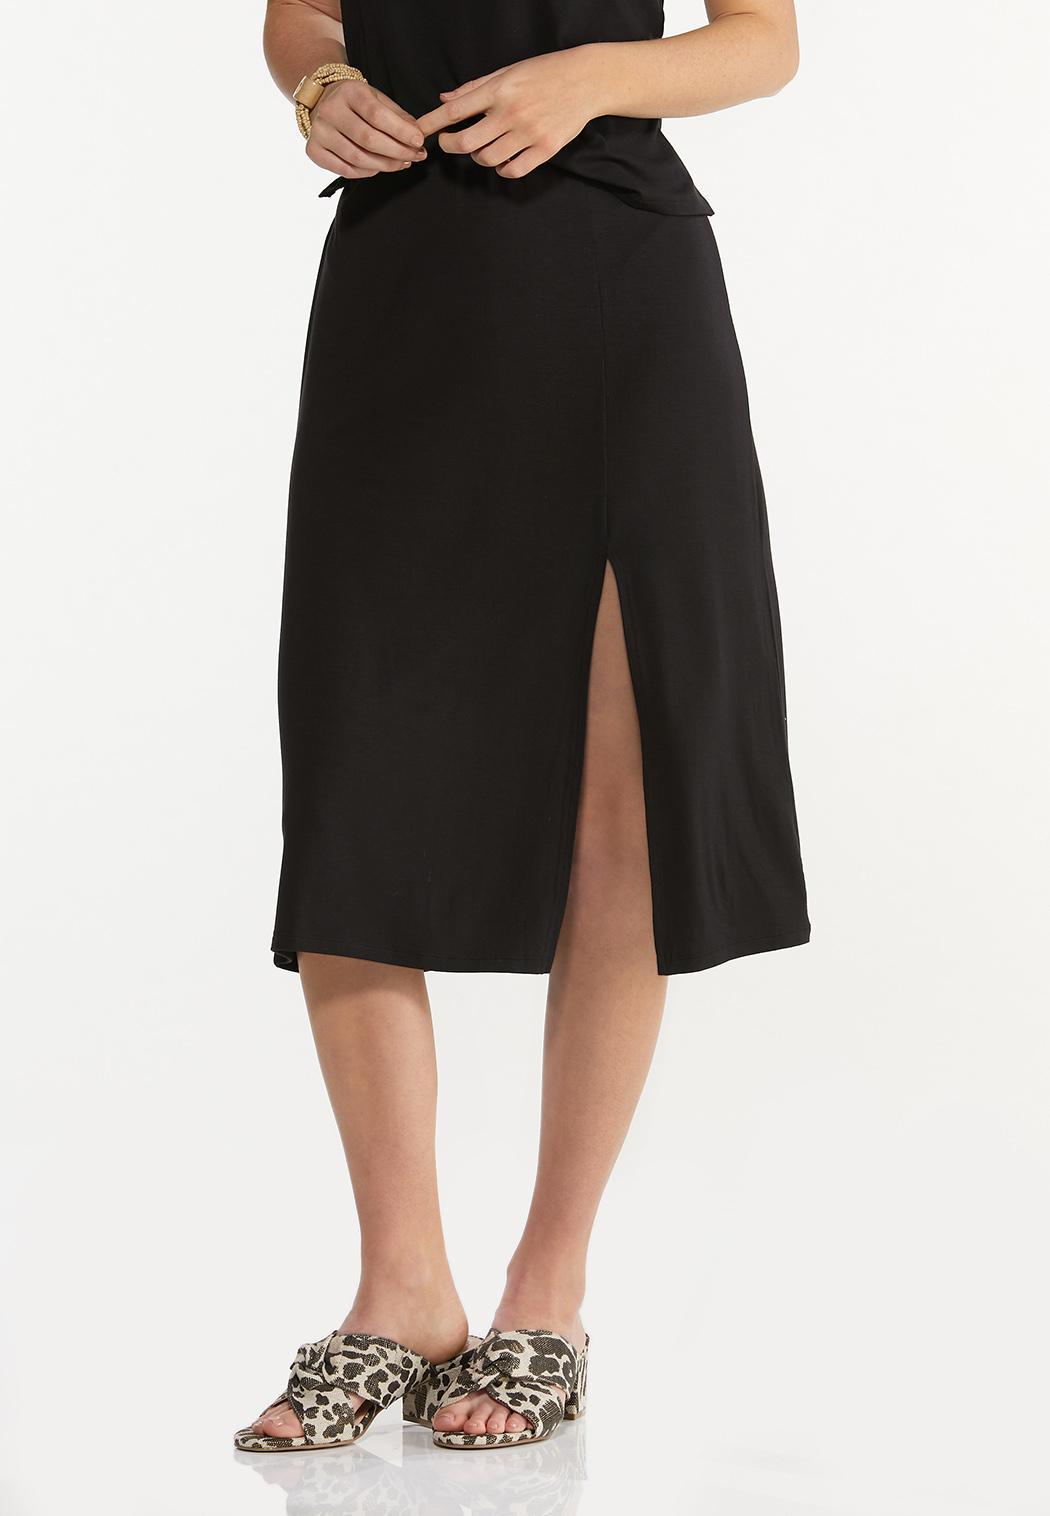 Plus Size Black Front Slit Skirt